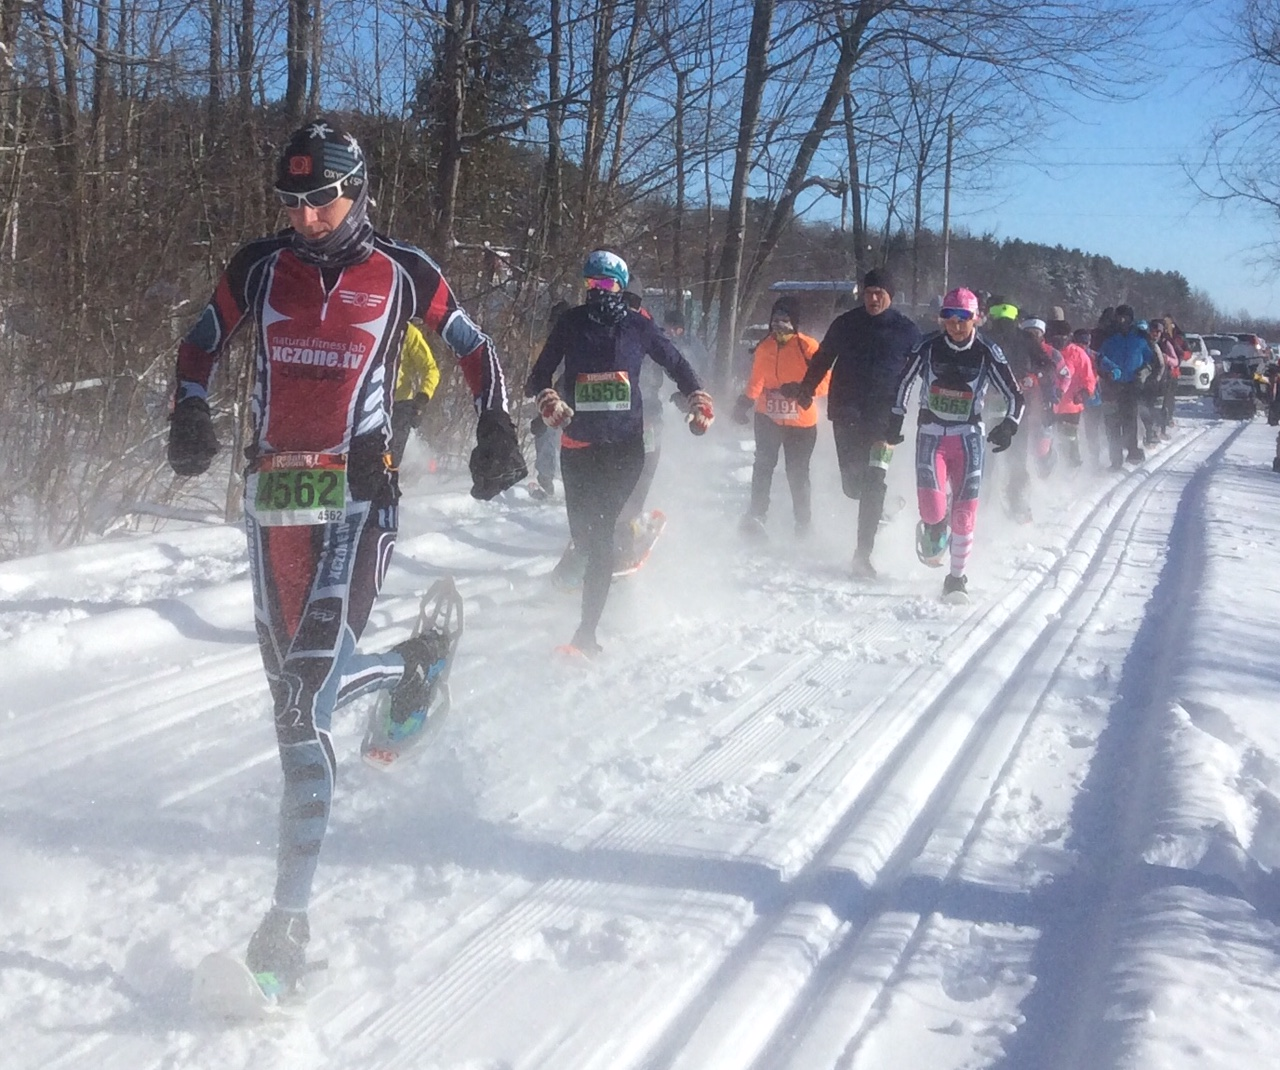 Summerstown snowshoe race sees flurry of fun